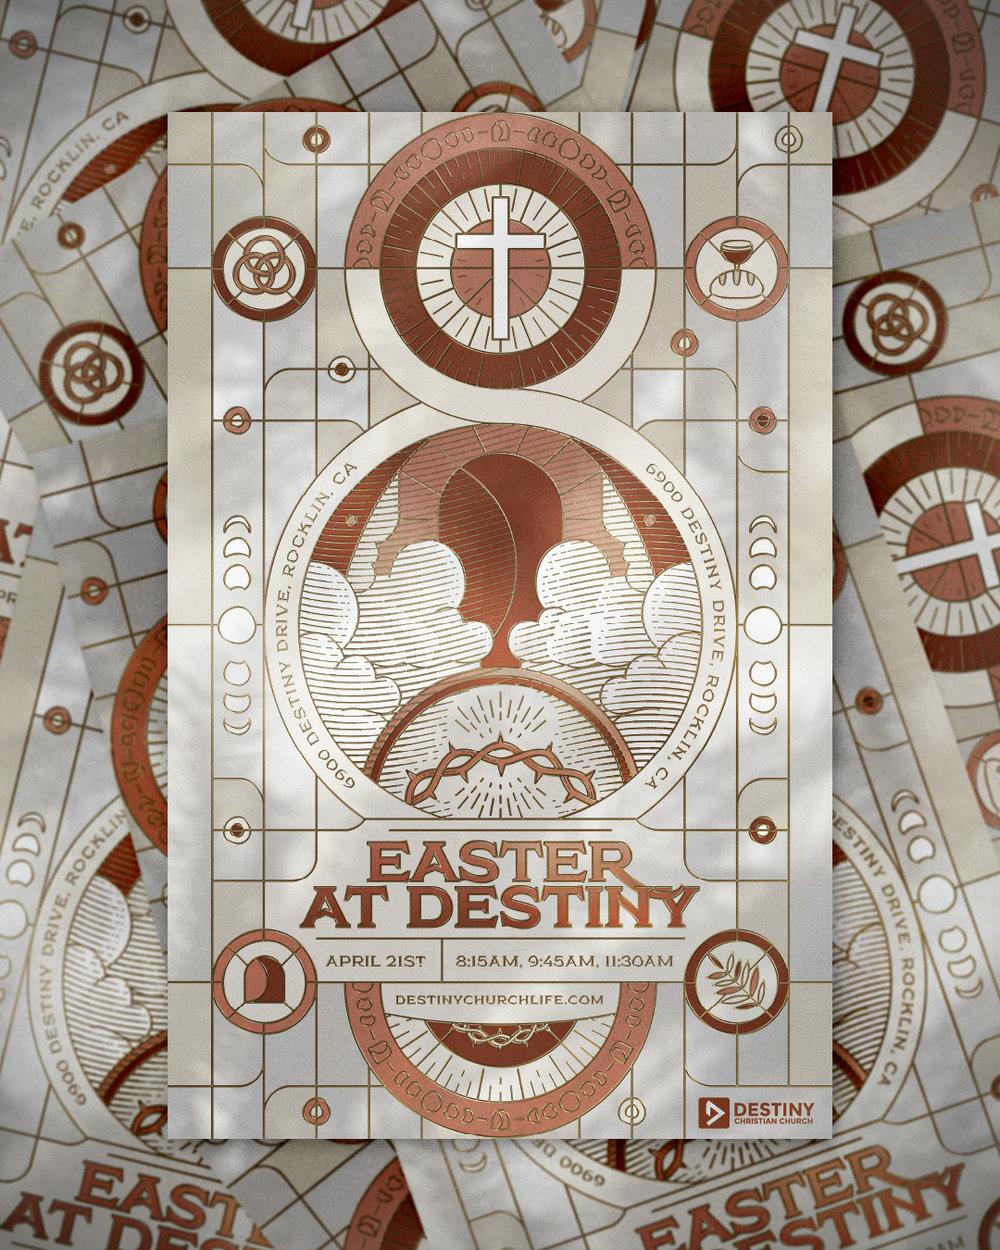 Easter-At-Destiny_Poster_11x17_02.jpg